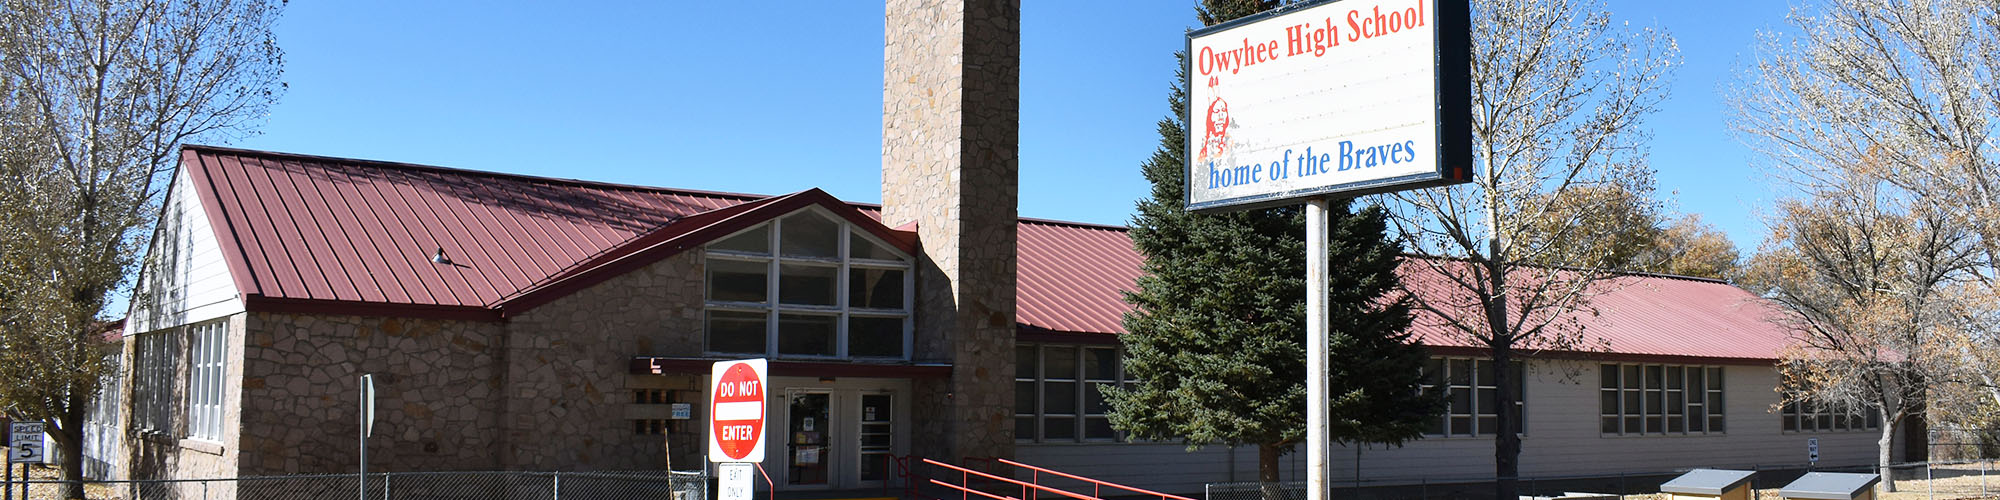 Front view of Owyhee School